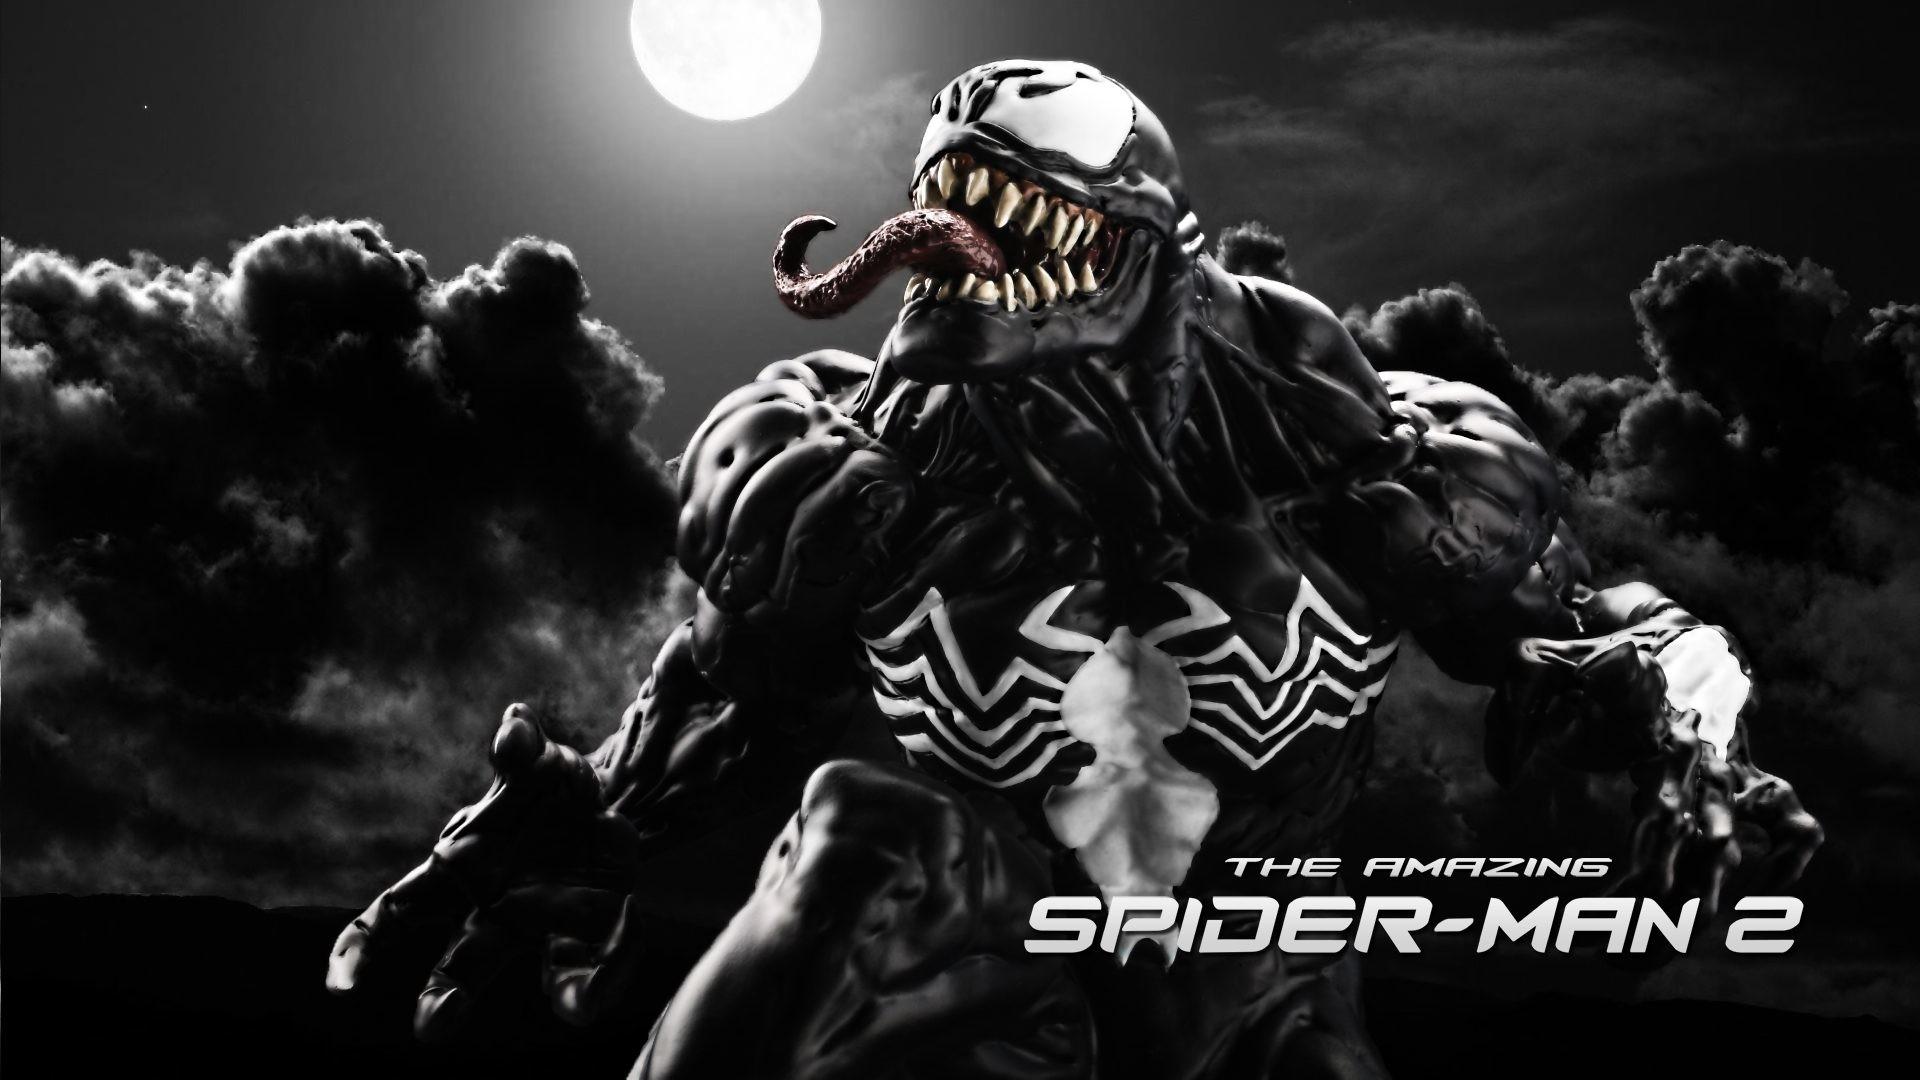 The Amazingpider Man 2 Venom 4K Uhd Wallpaper